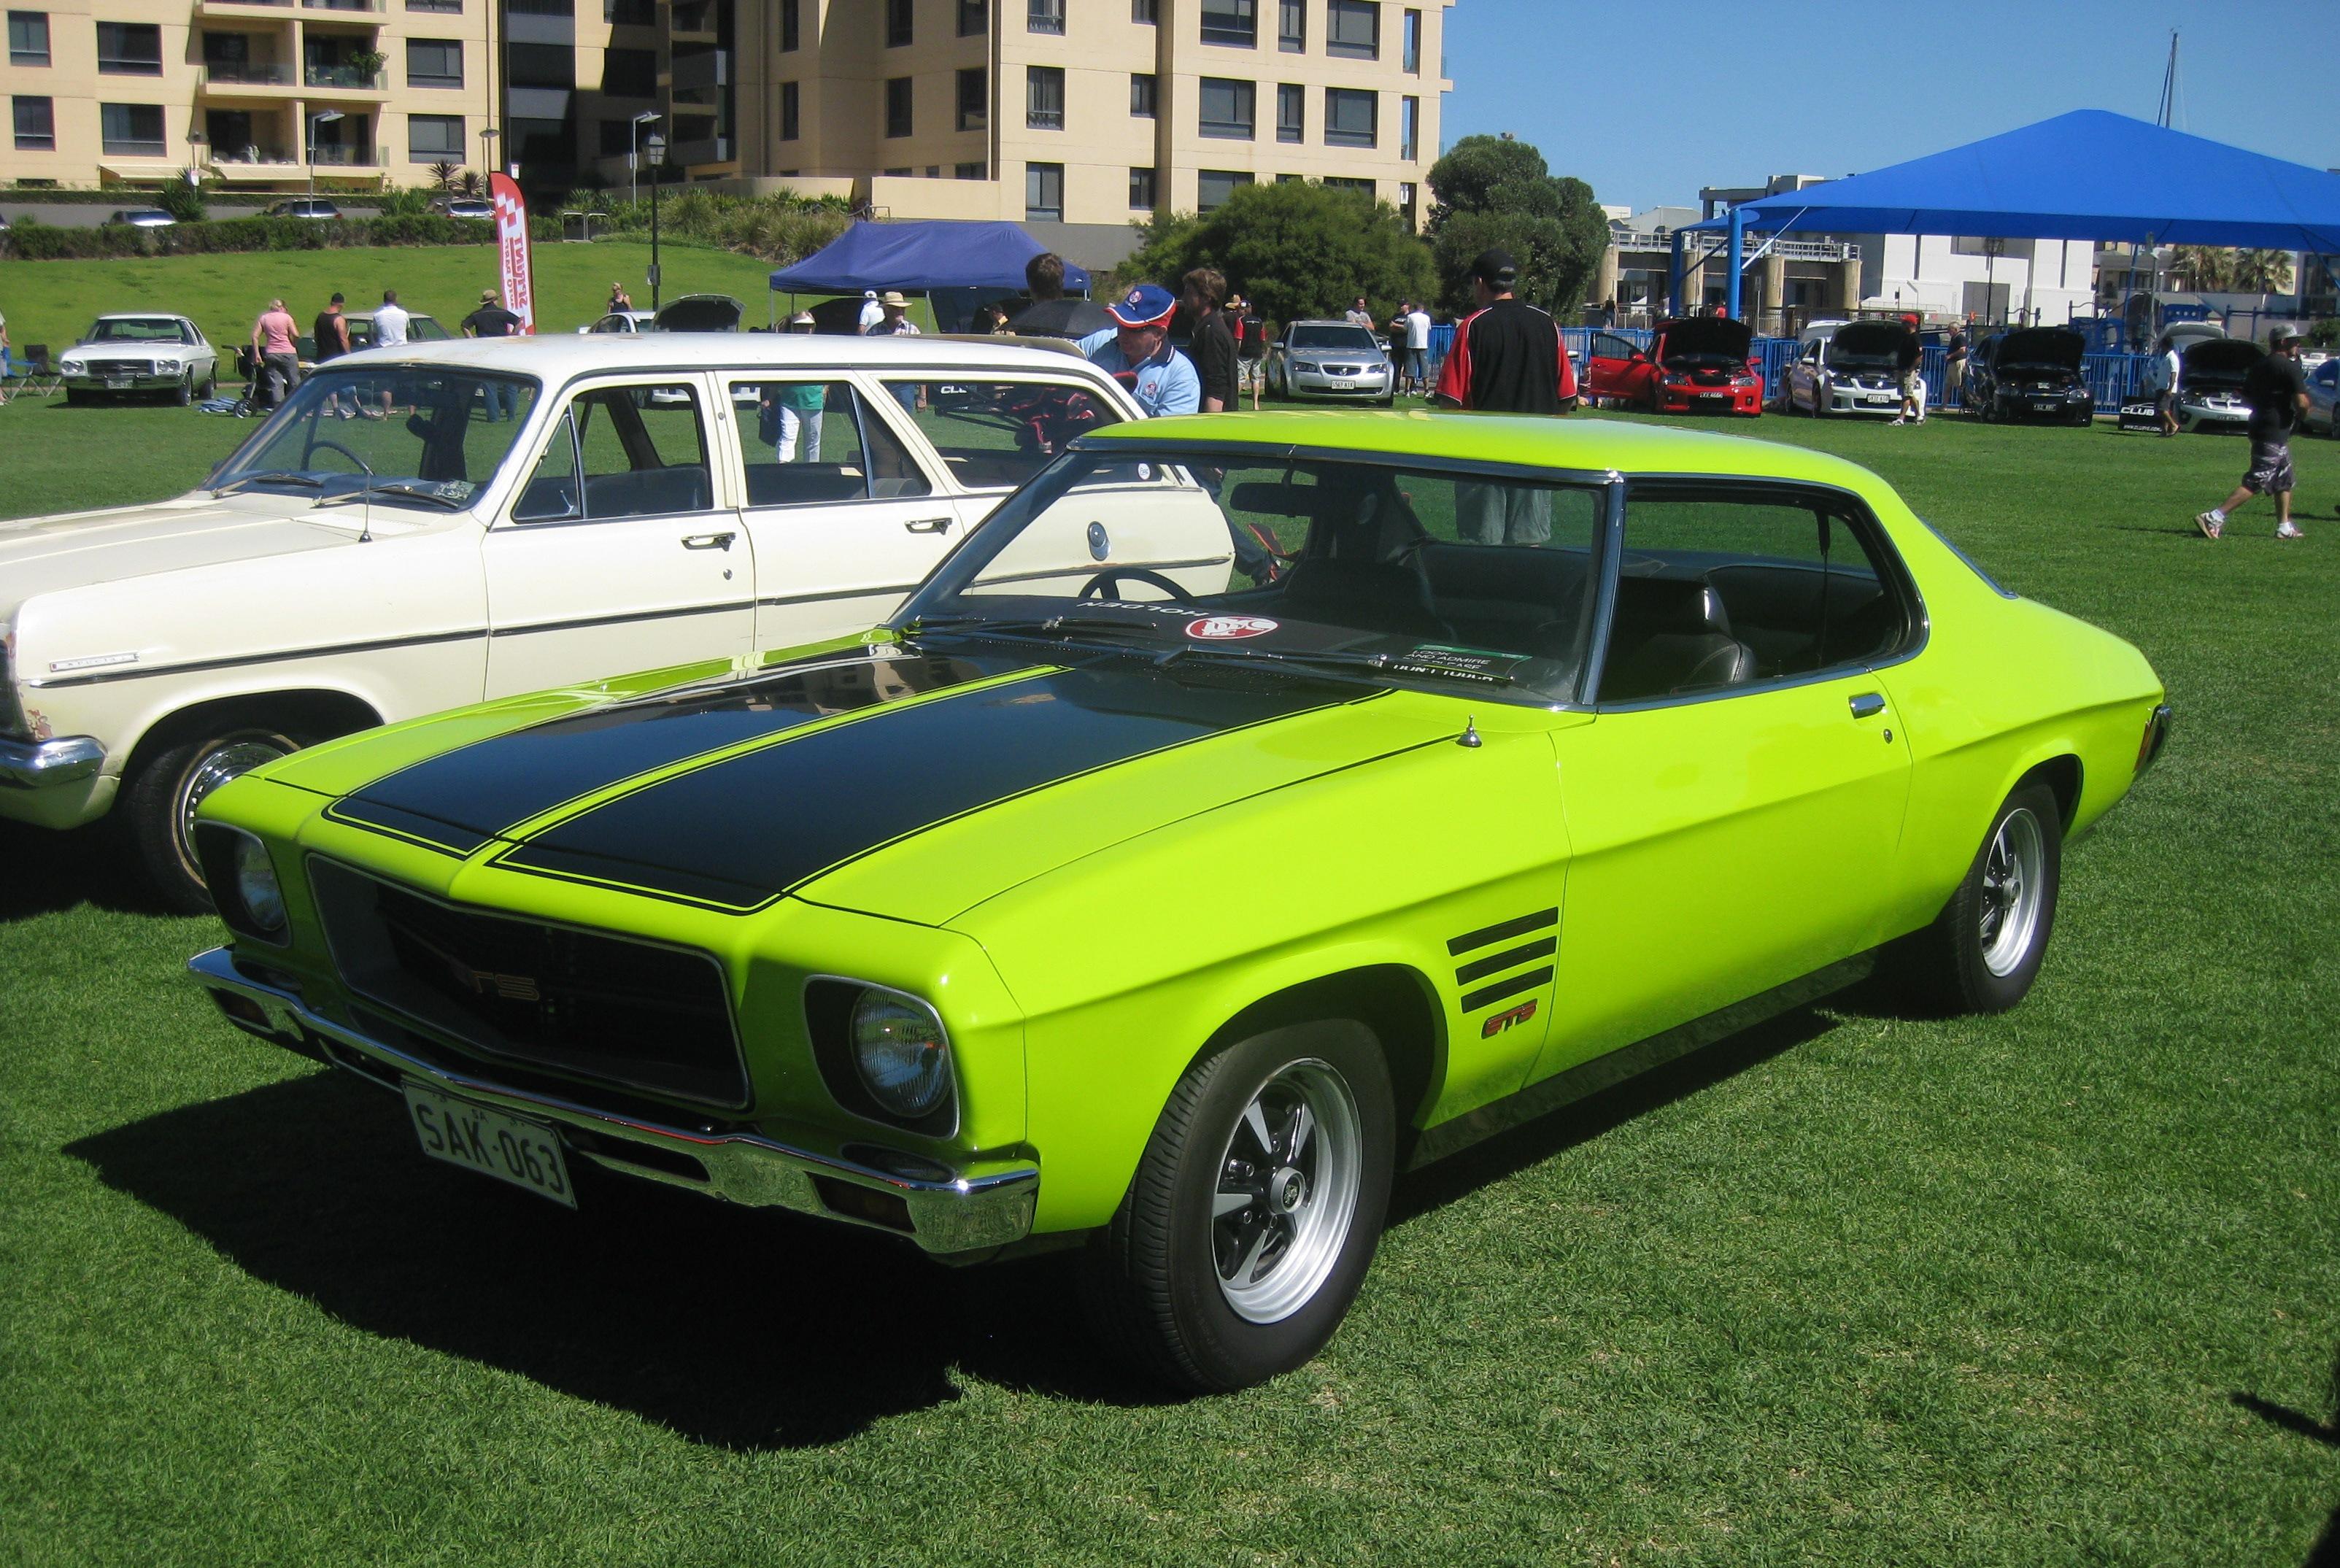 File:Holden HQ Monaro GTS Coupe (1).JPG - Wikimedia Commons